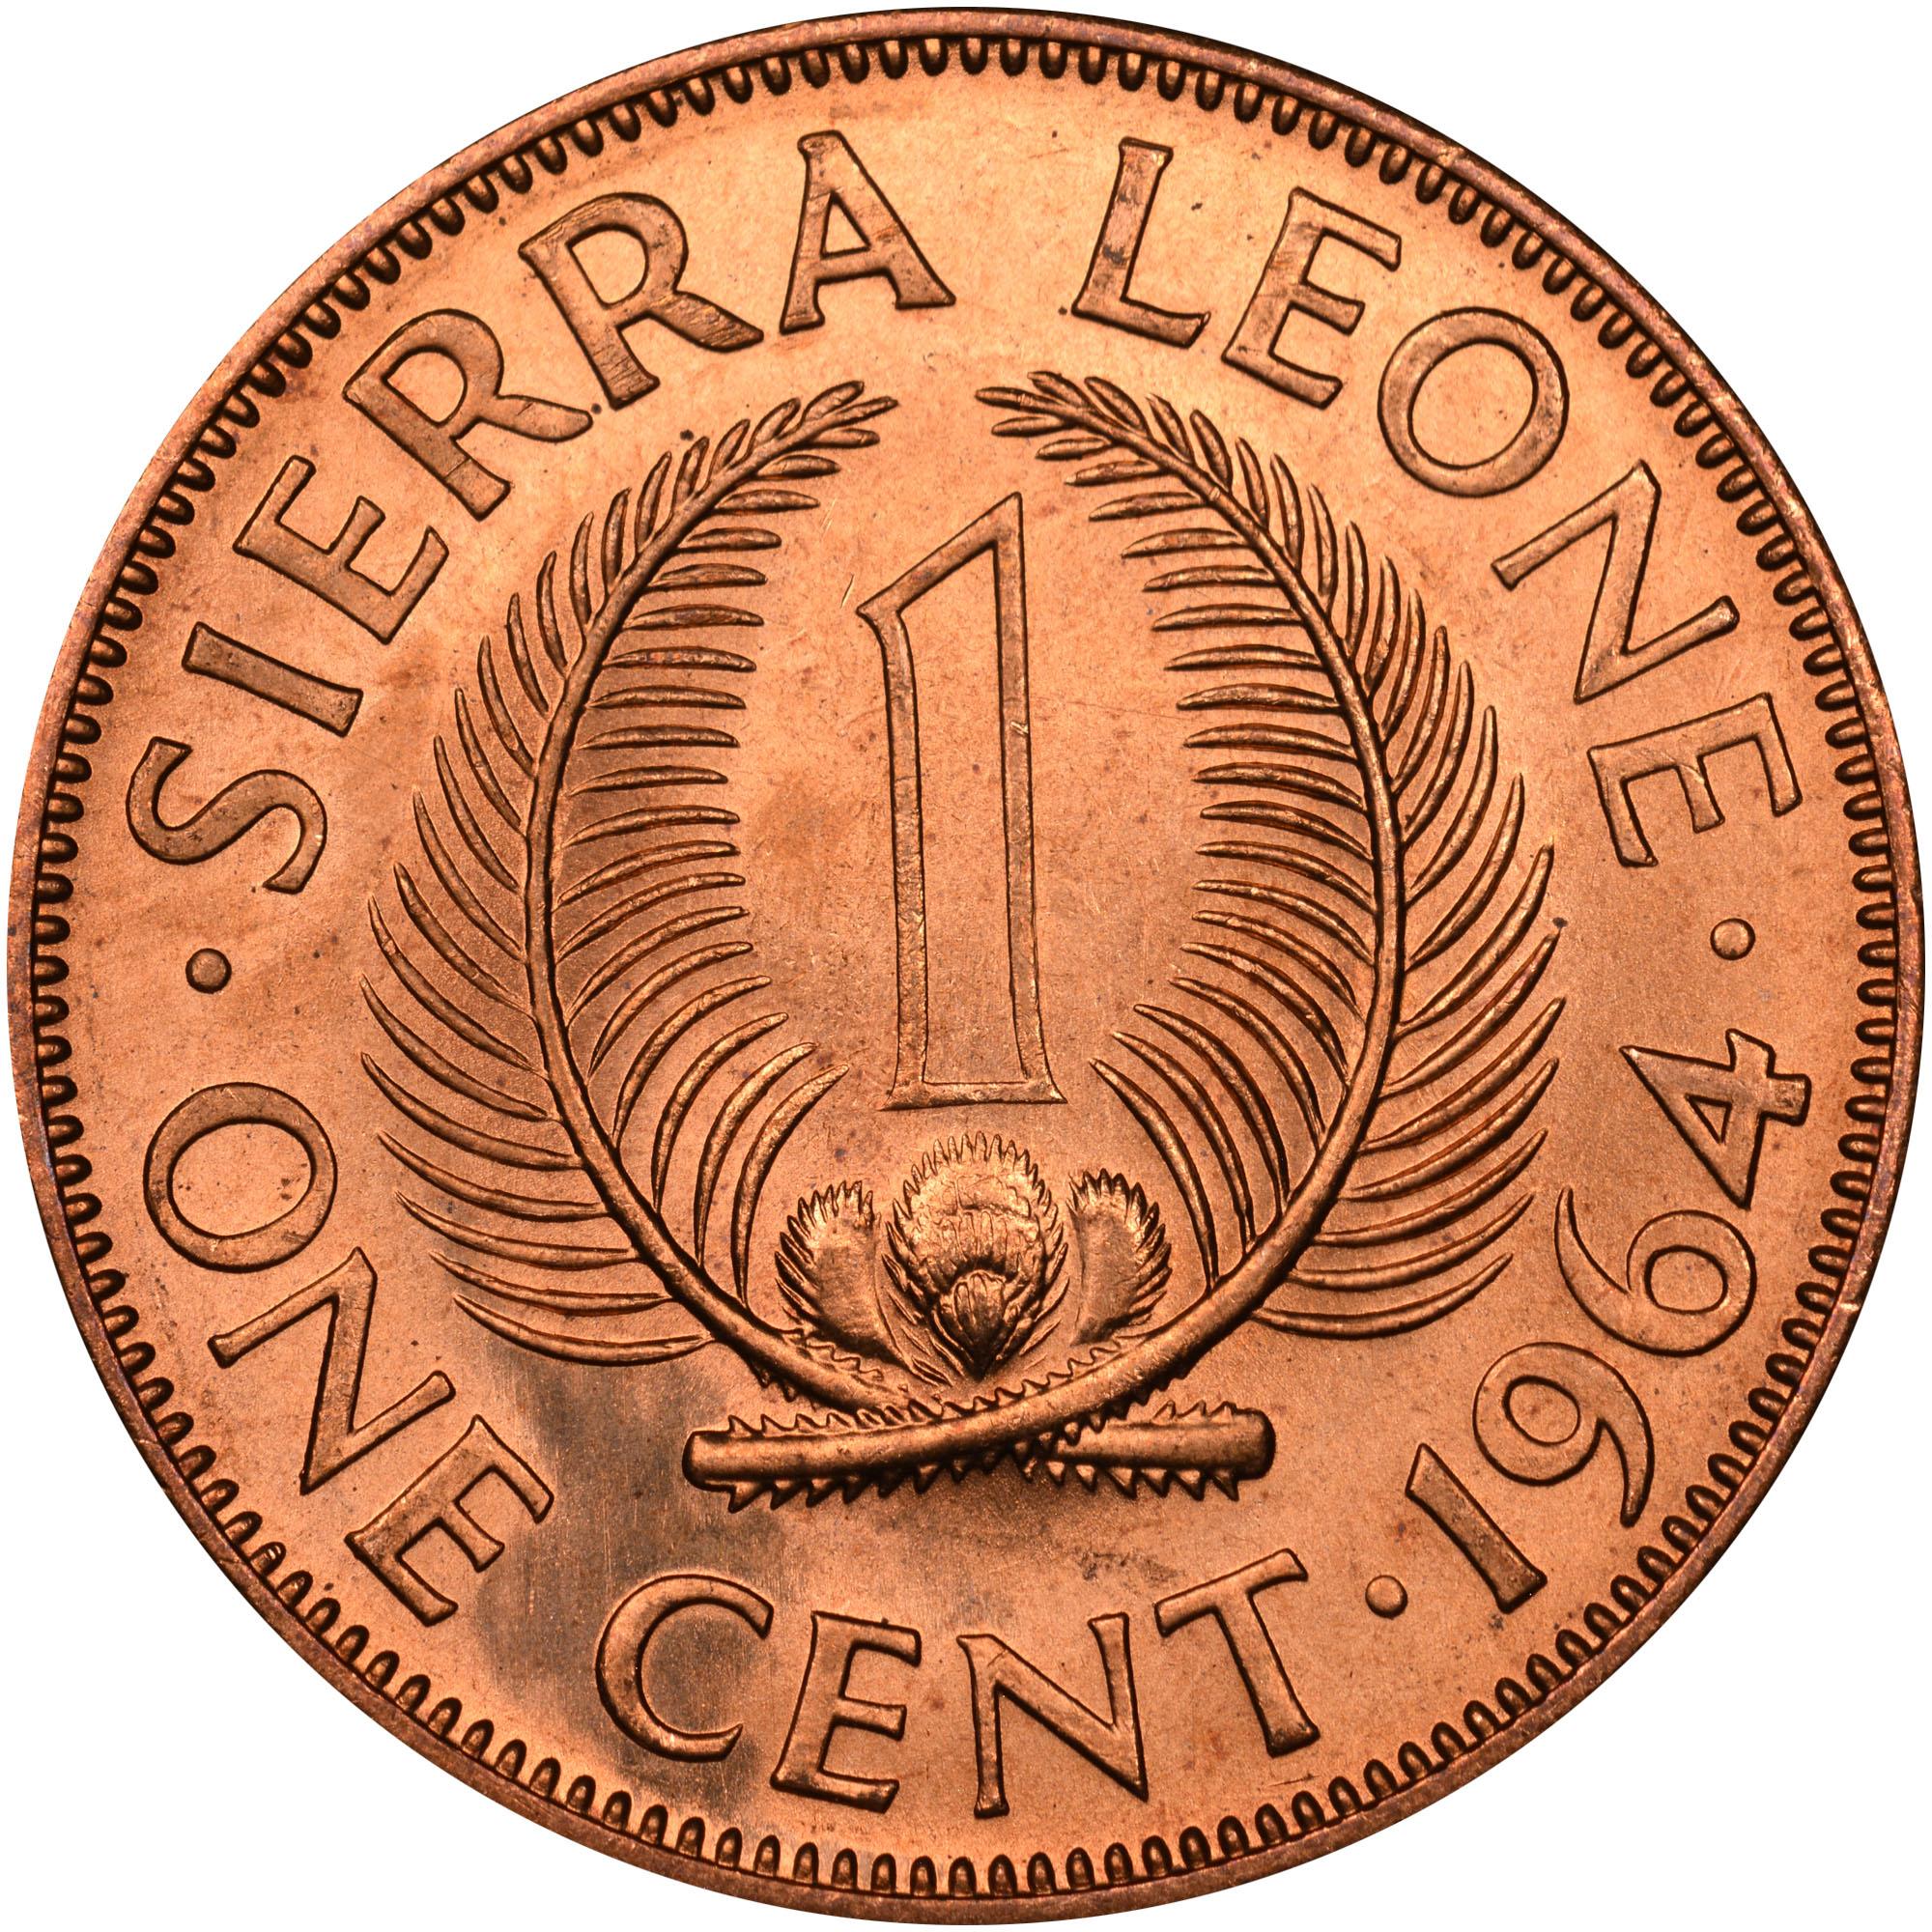 Sierra Leone Cent Km 17 Prices Values Ngc